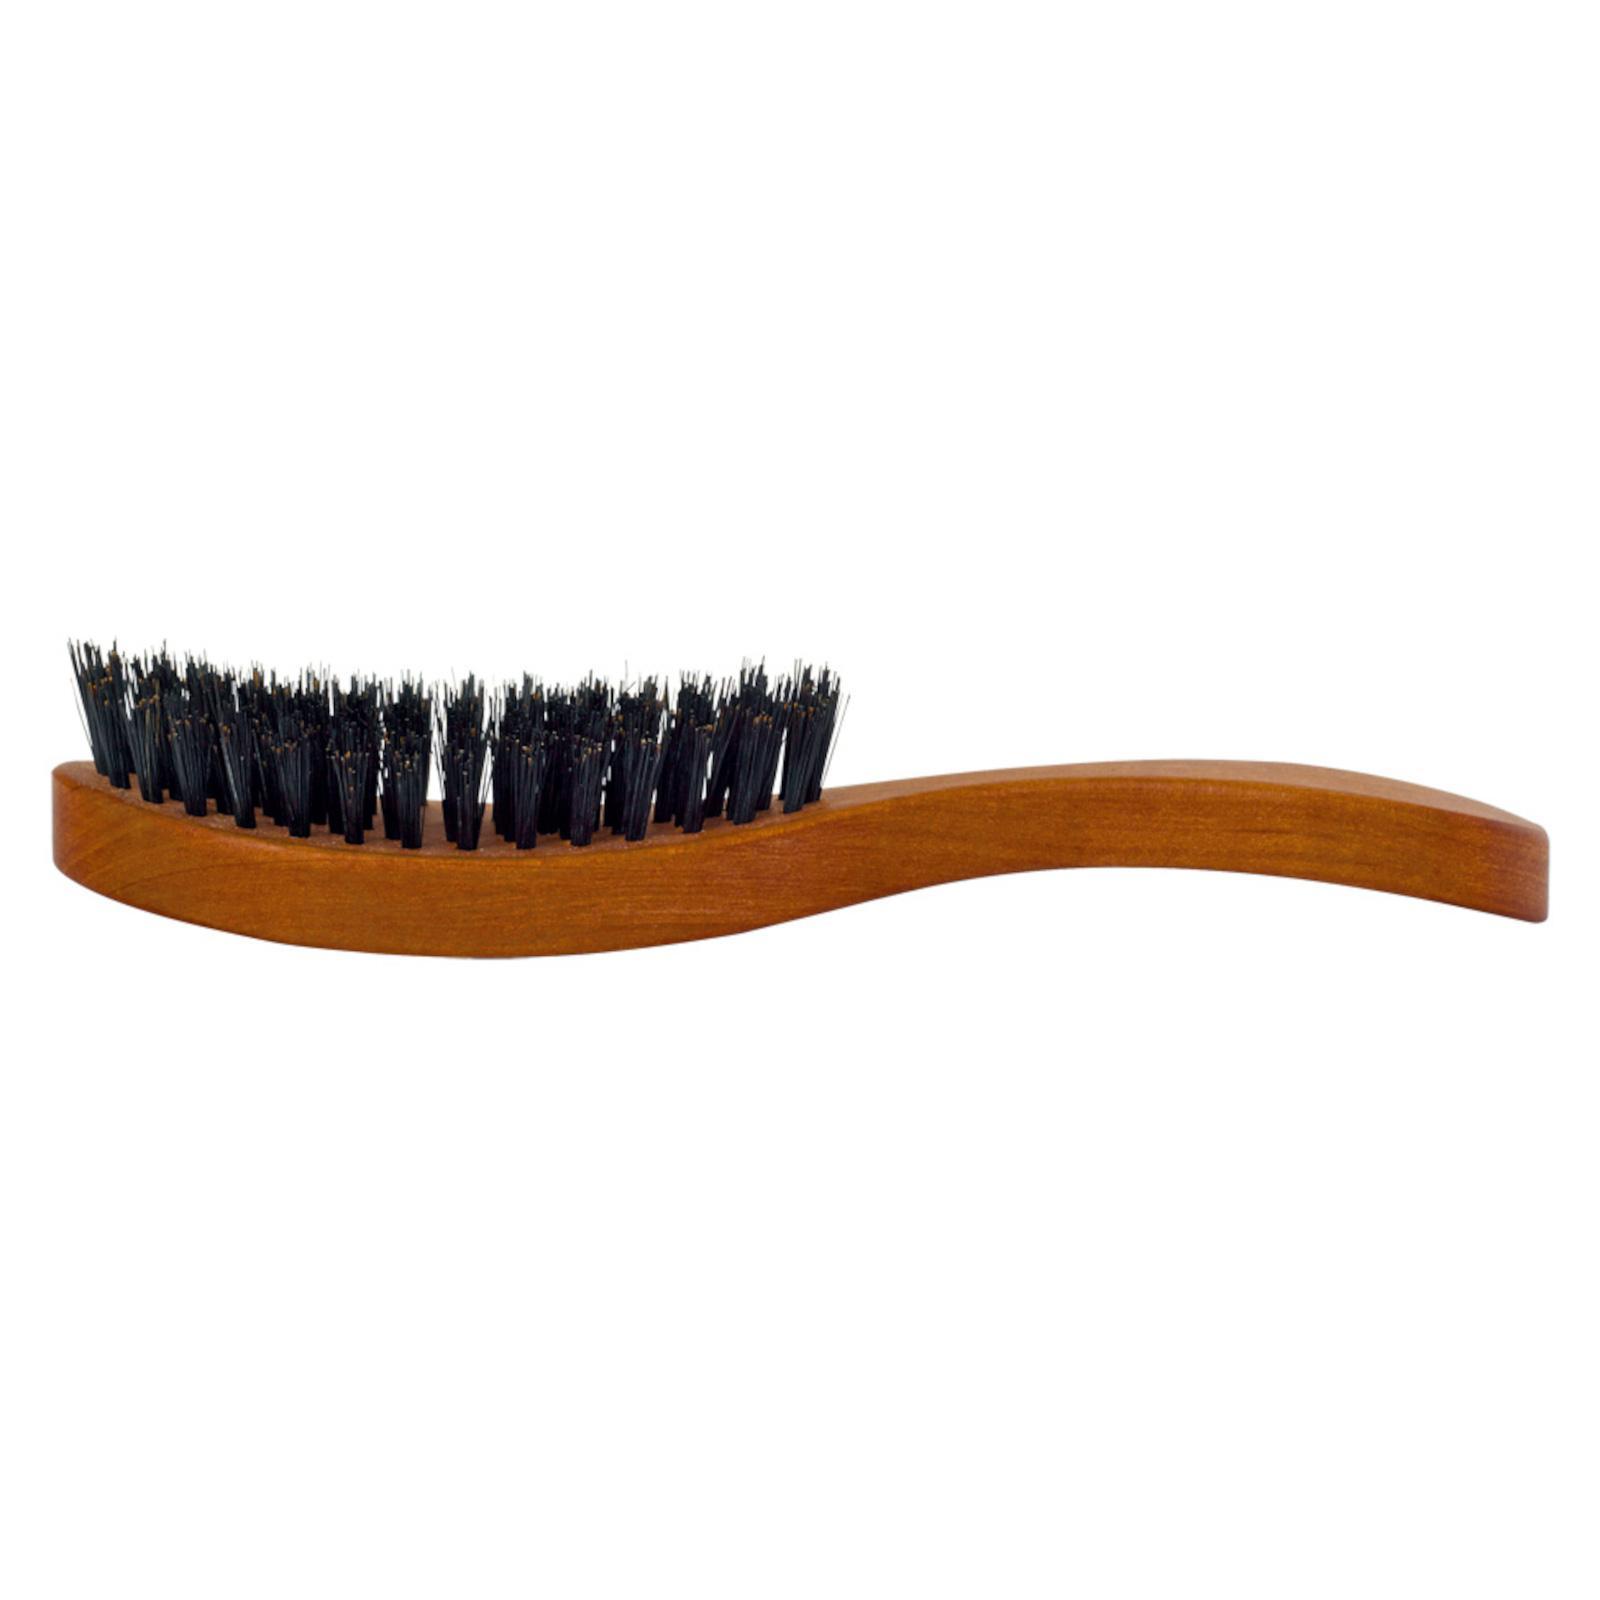 Redecker Kartáč na dlouhé vlasy z hruškového dřeva 21,5 cm